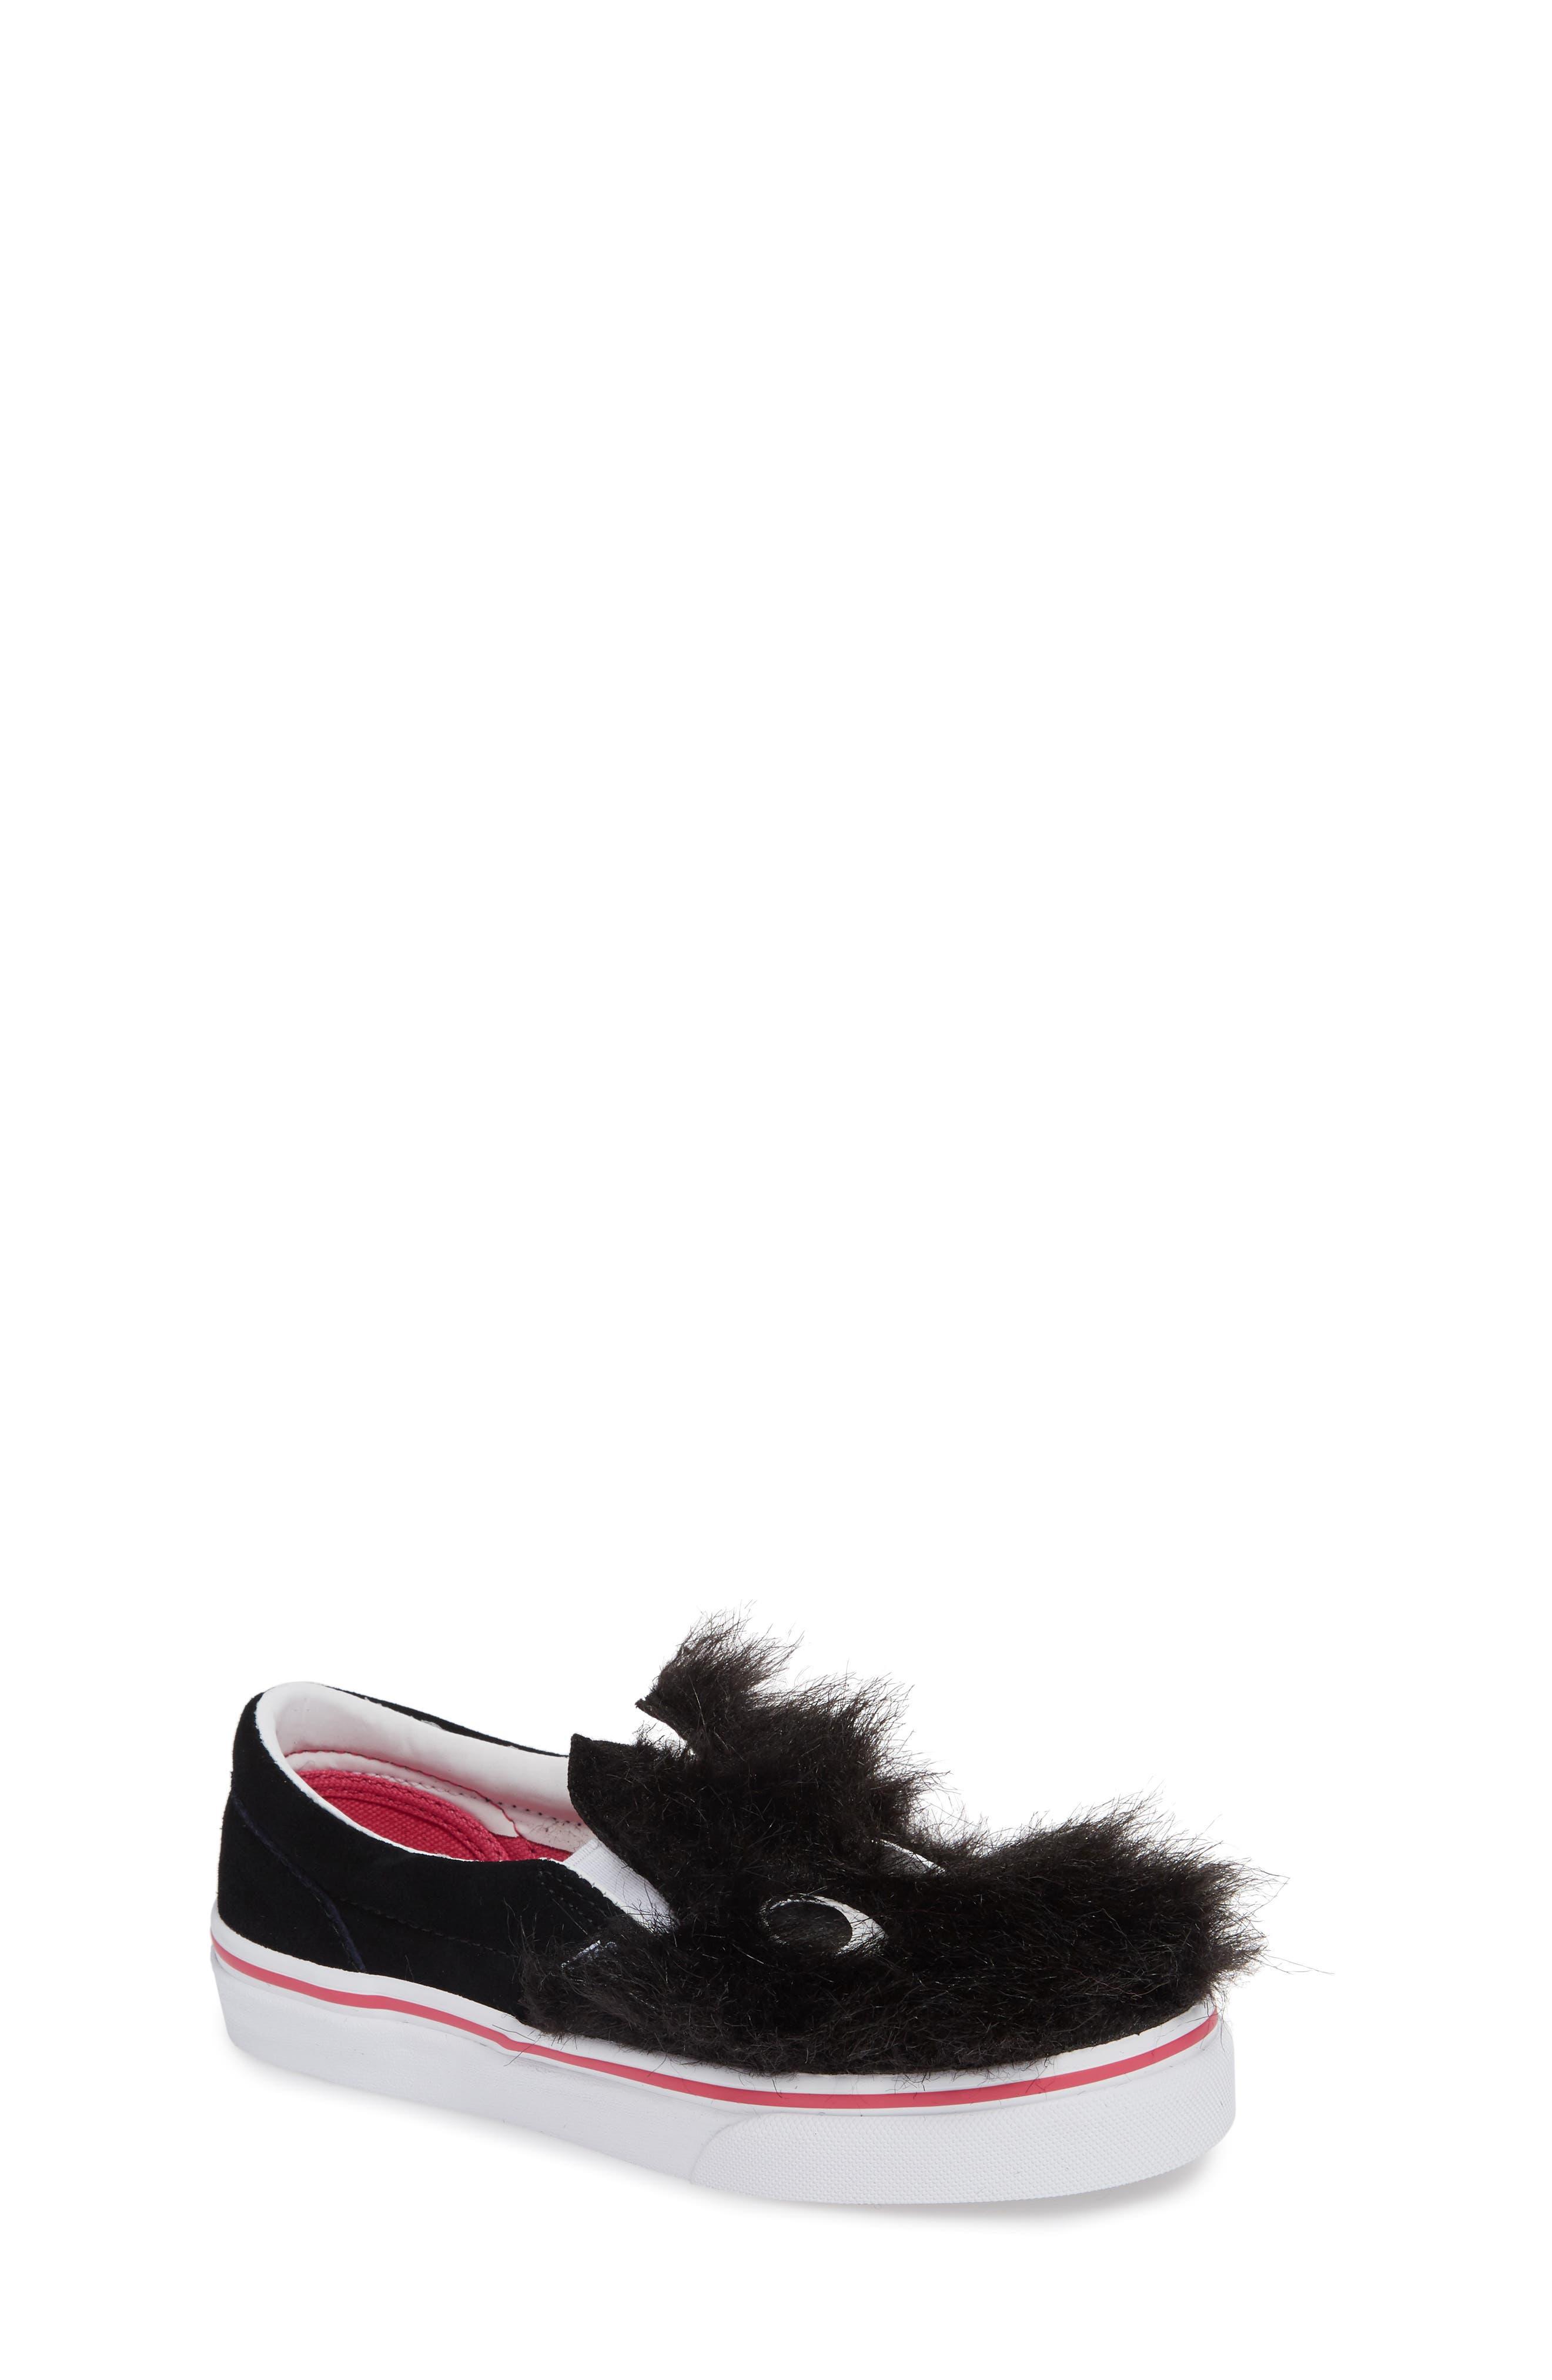 Friend Slip-On Sneaker,                             Main thumbnail 1, color,                             002